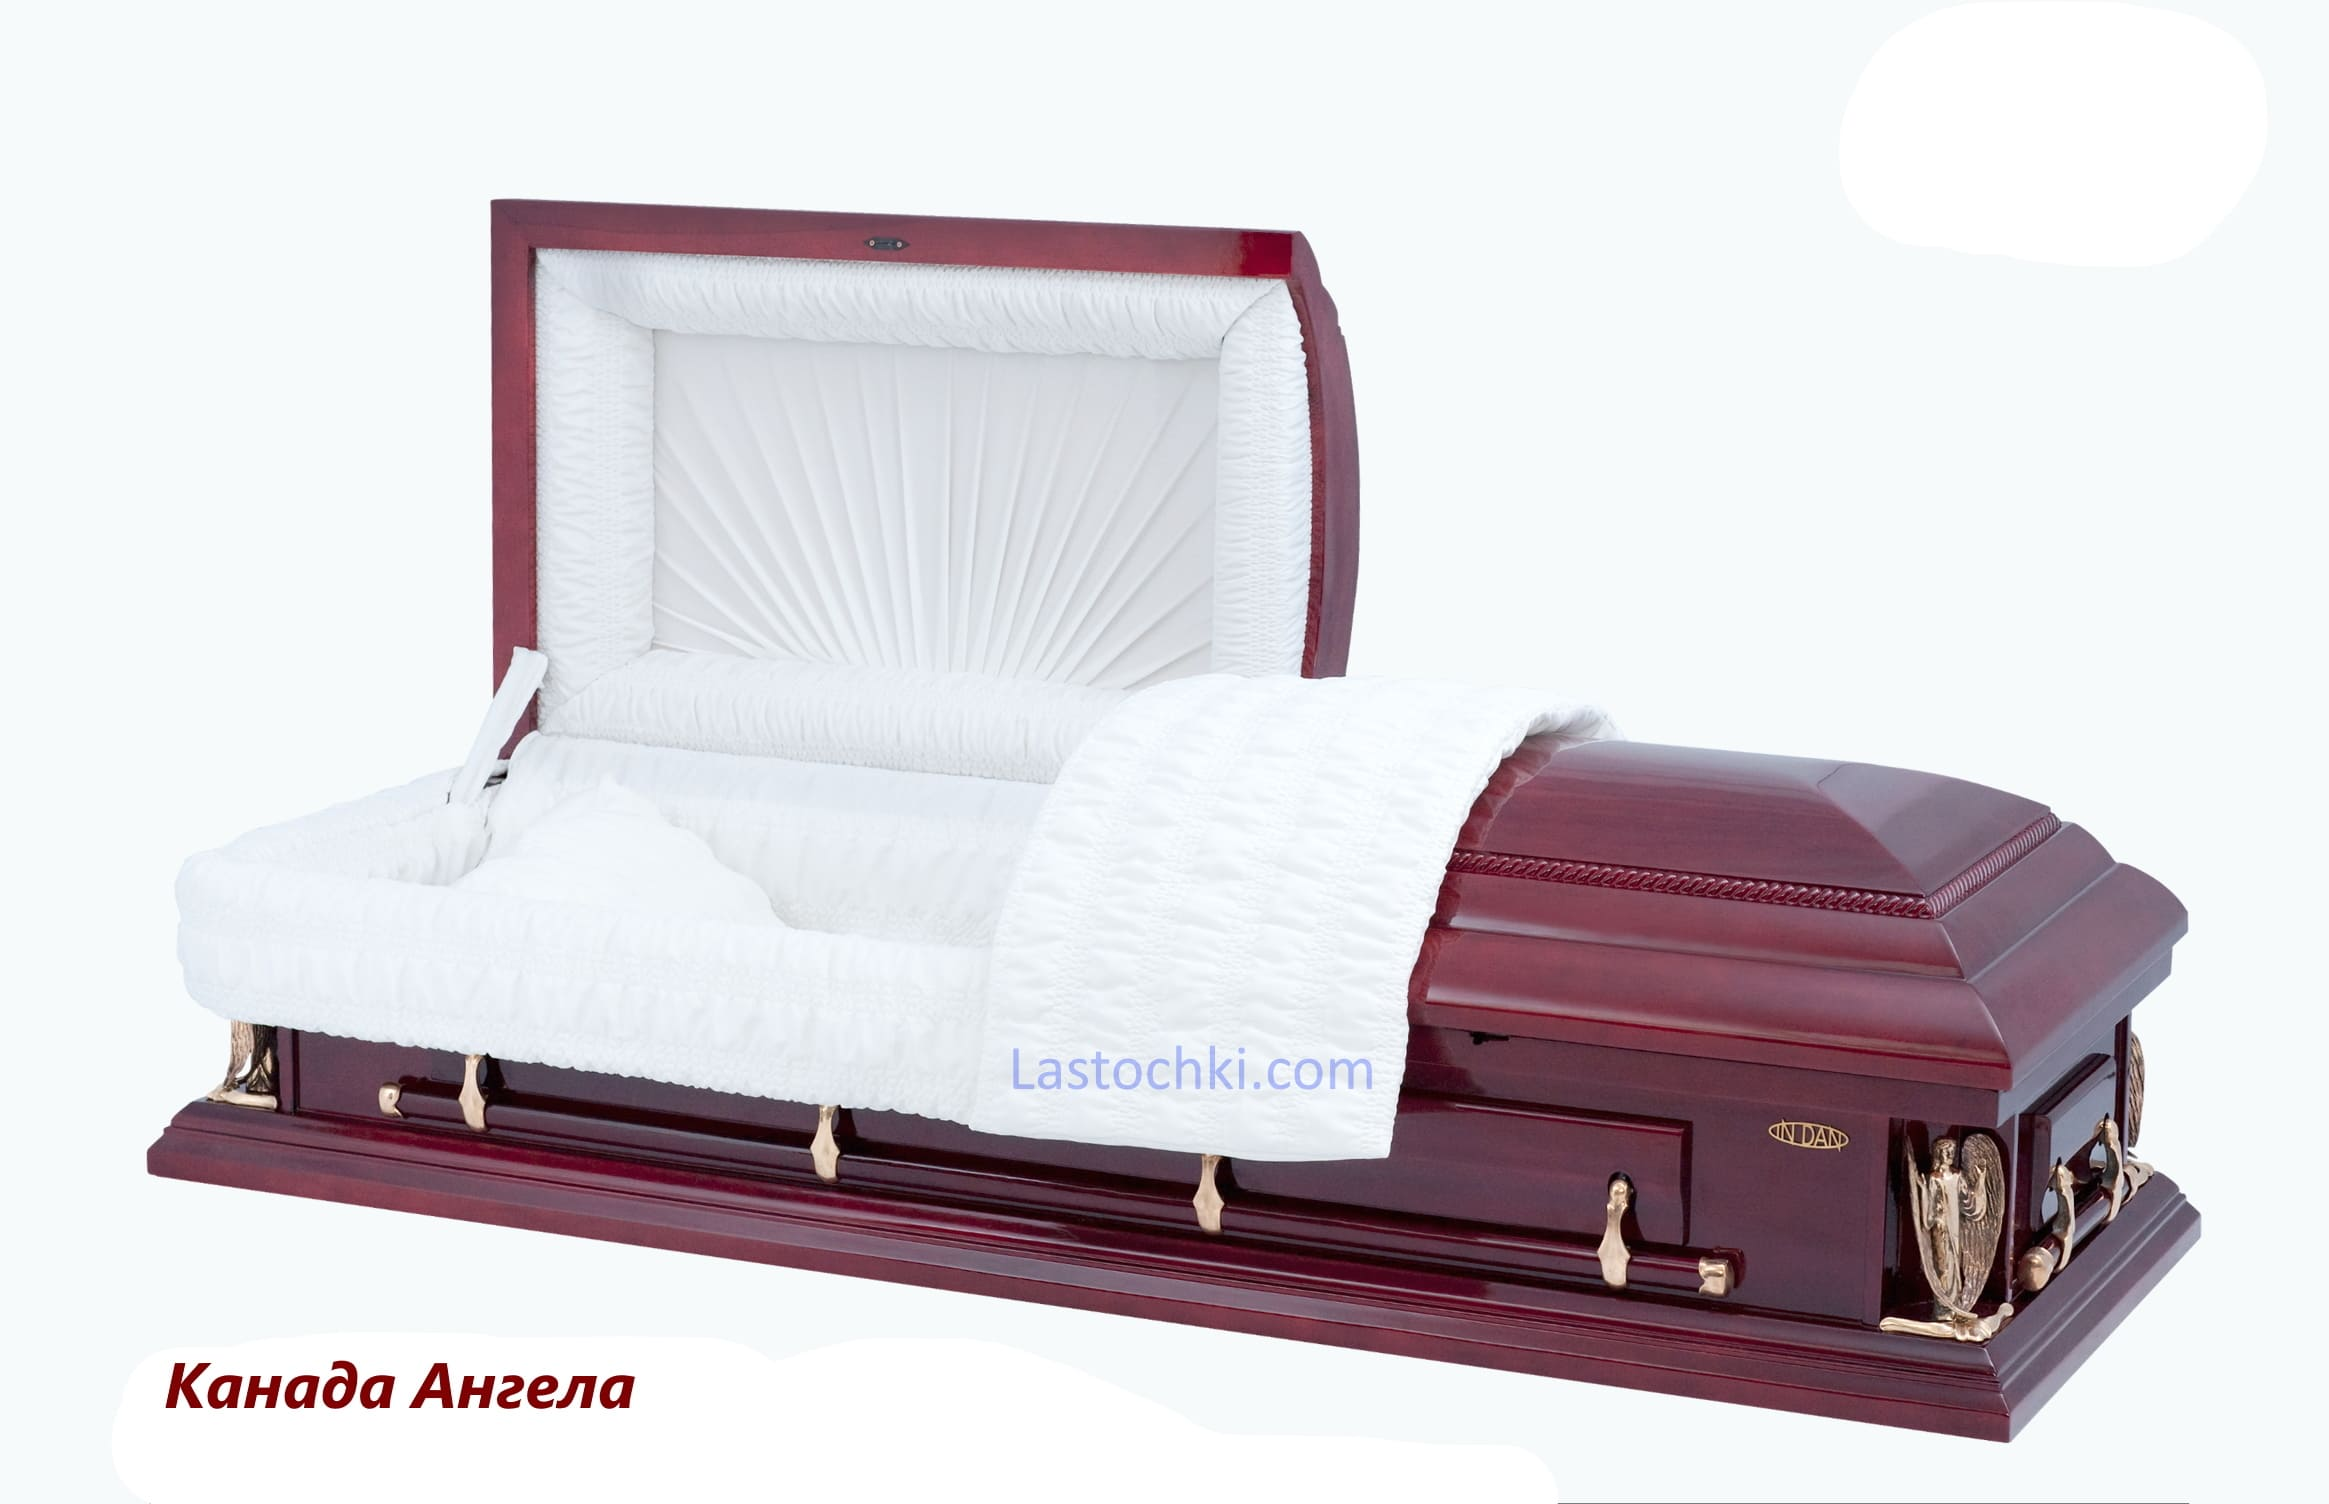 Саркофаг Канада Ангела  -  Цена 90 000 грн.